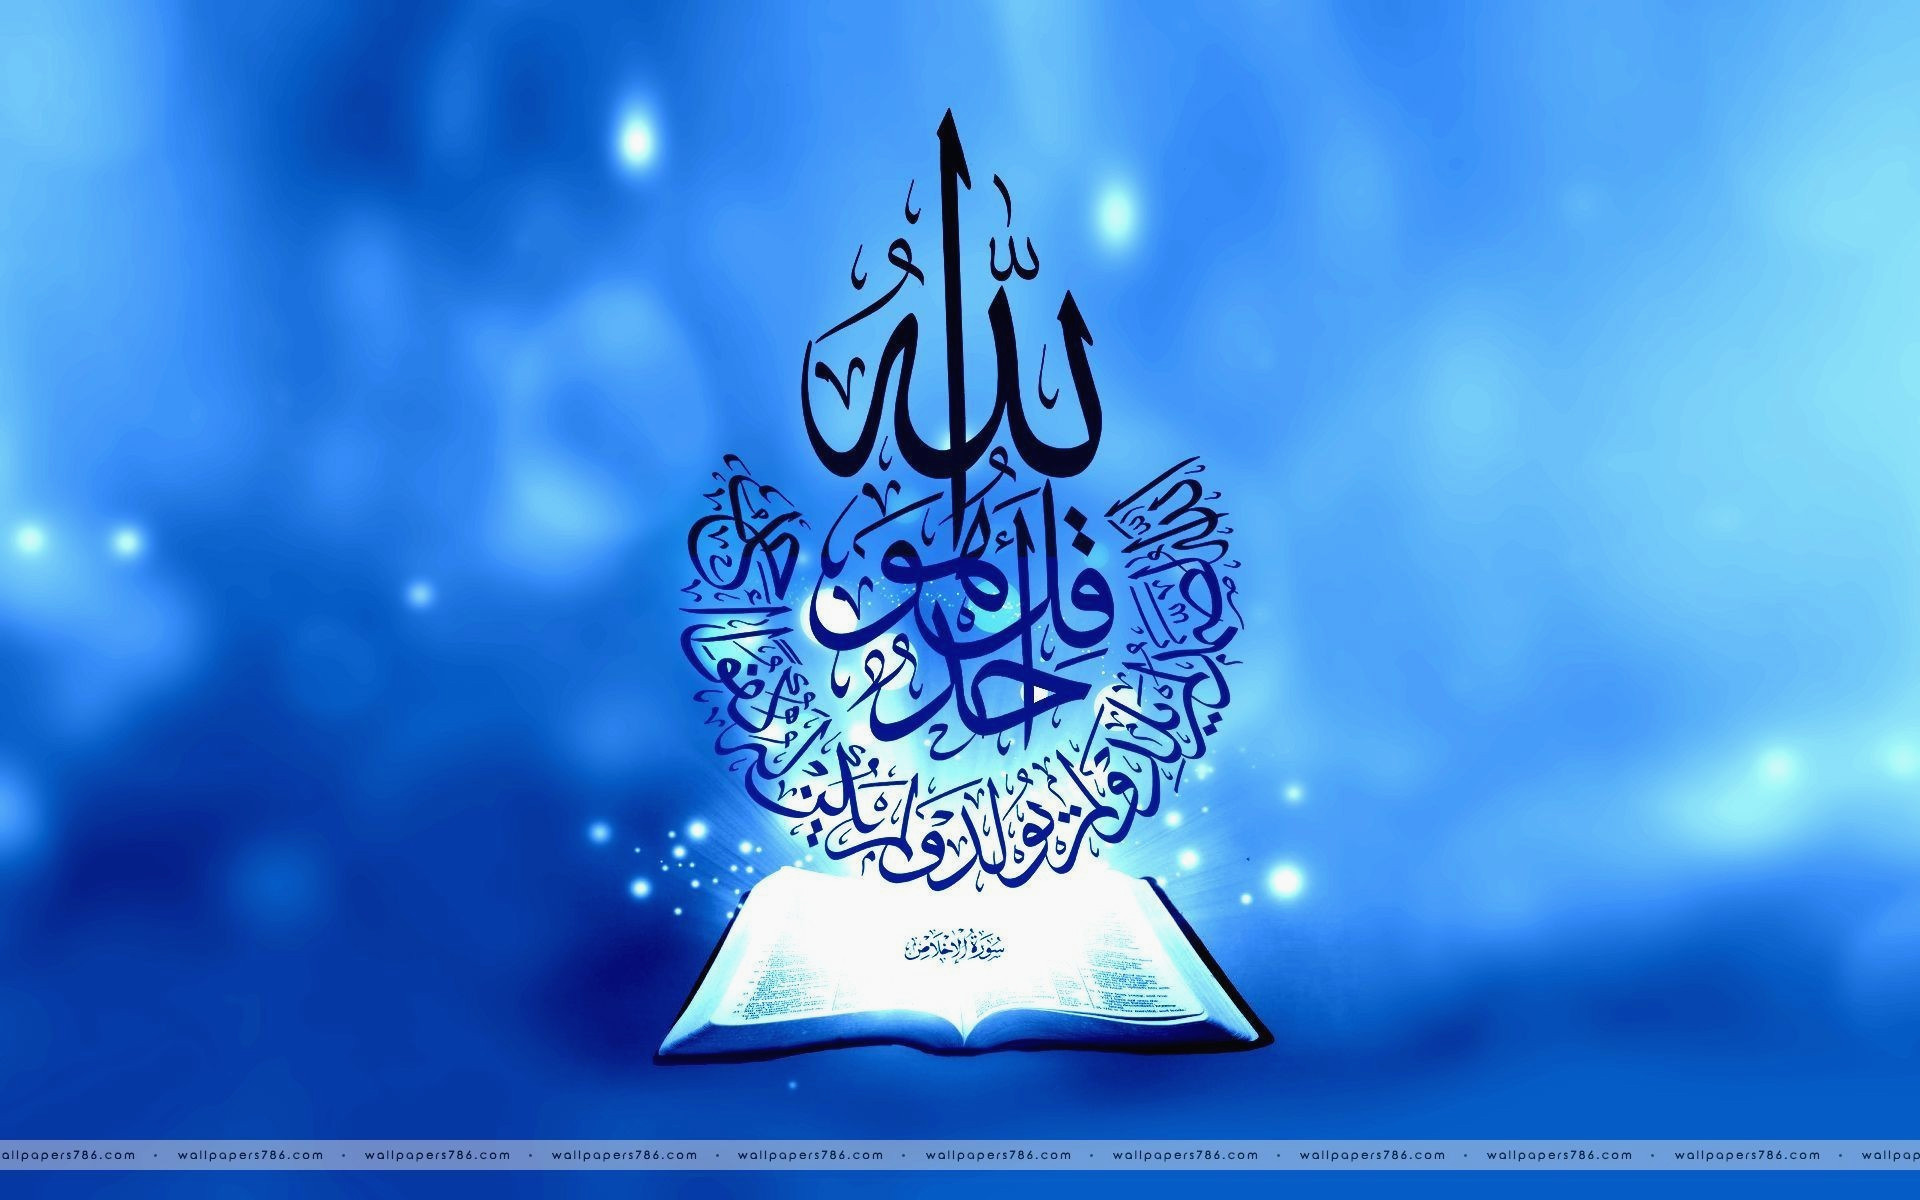 Hd Islamic Wallpaper For Laptop - 1600x1000 - Download HD ...